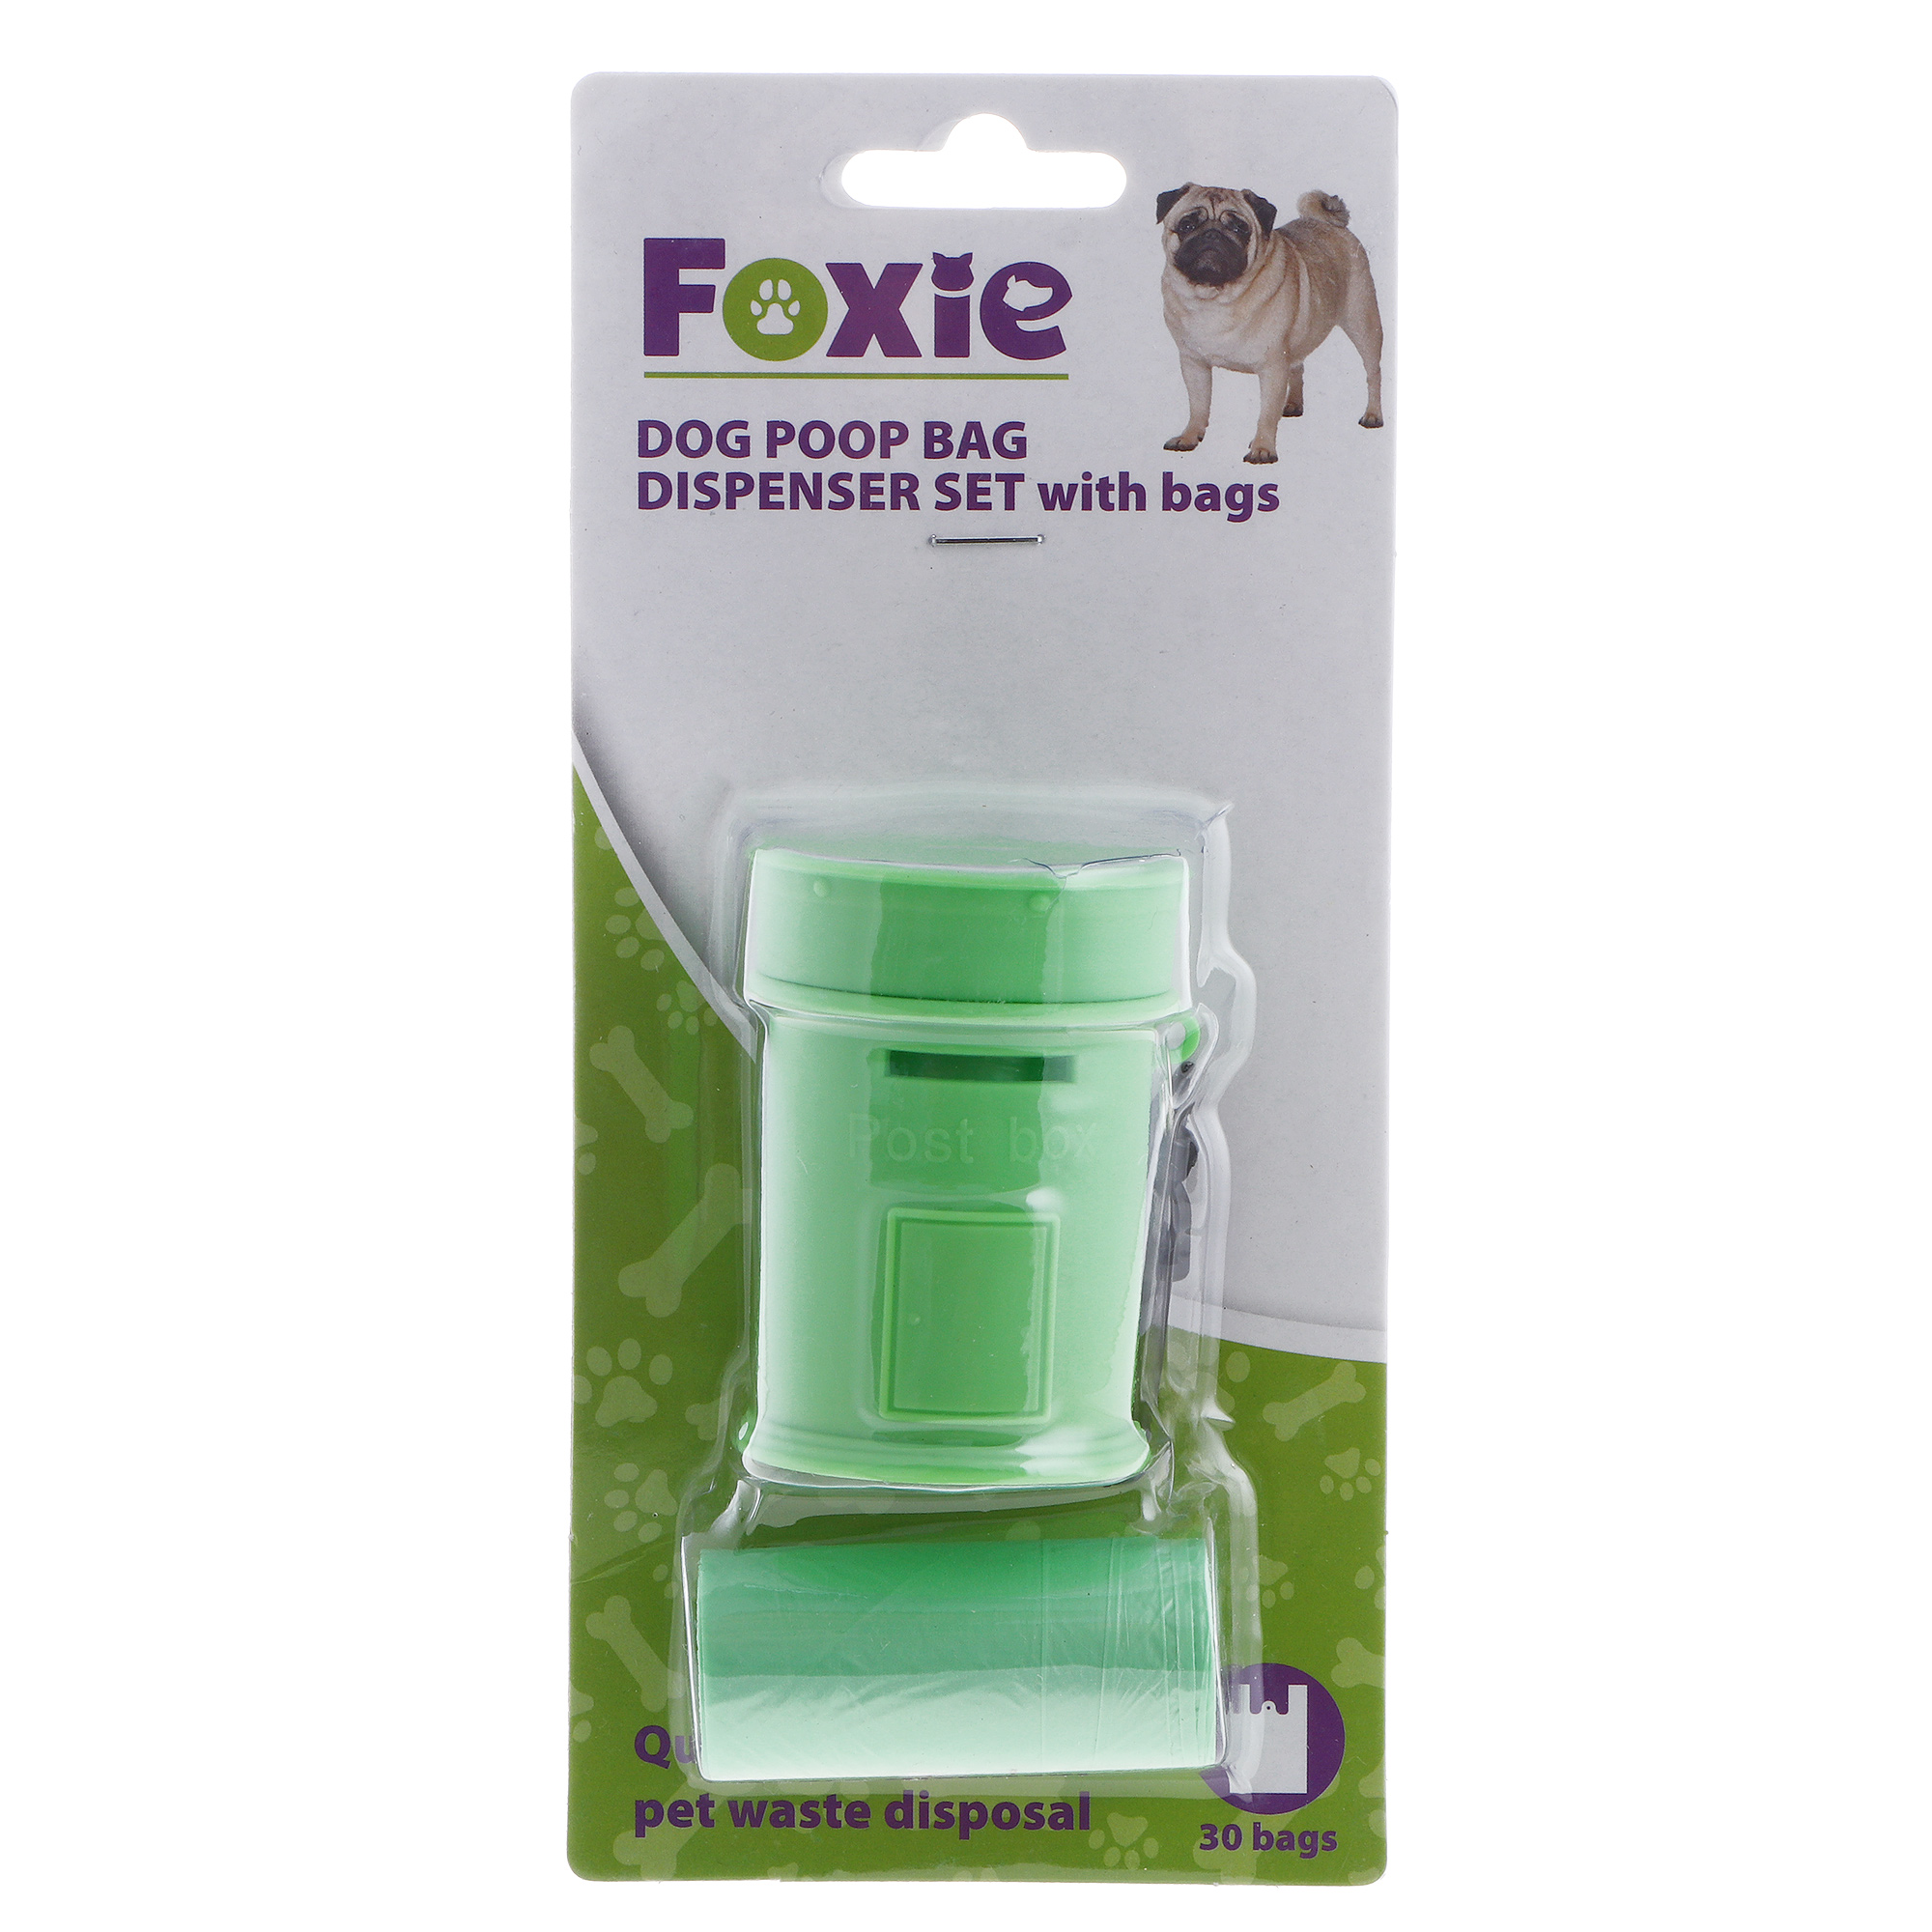 Набор для улицы Major foxie футляр+сменные пакеты синий 2 руллона х 15шт.